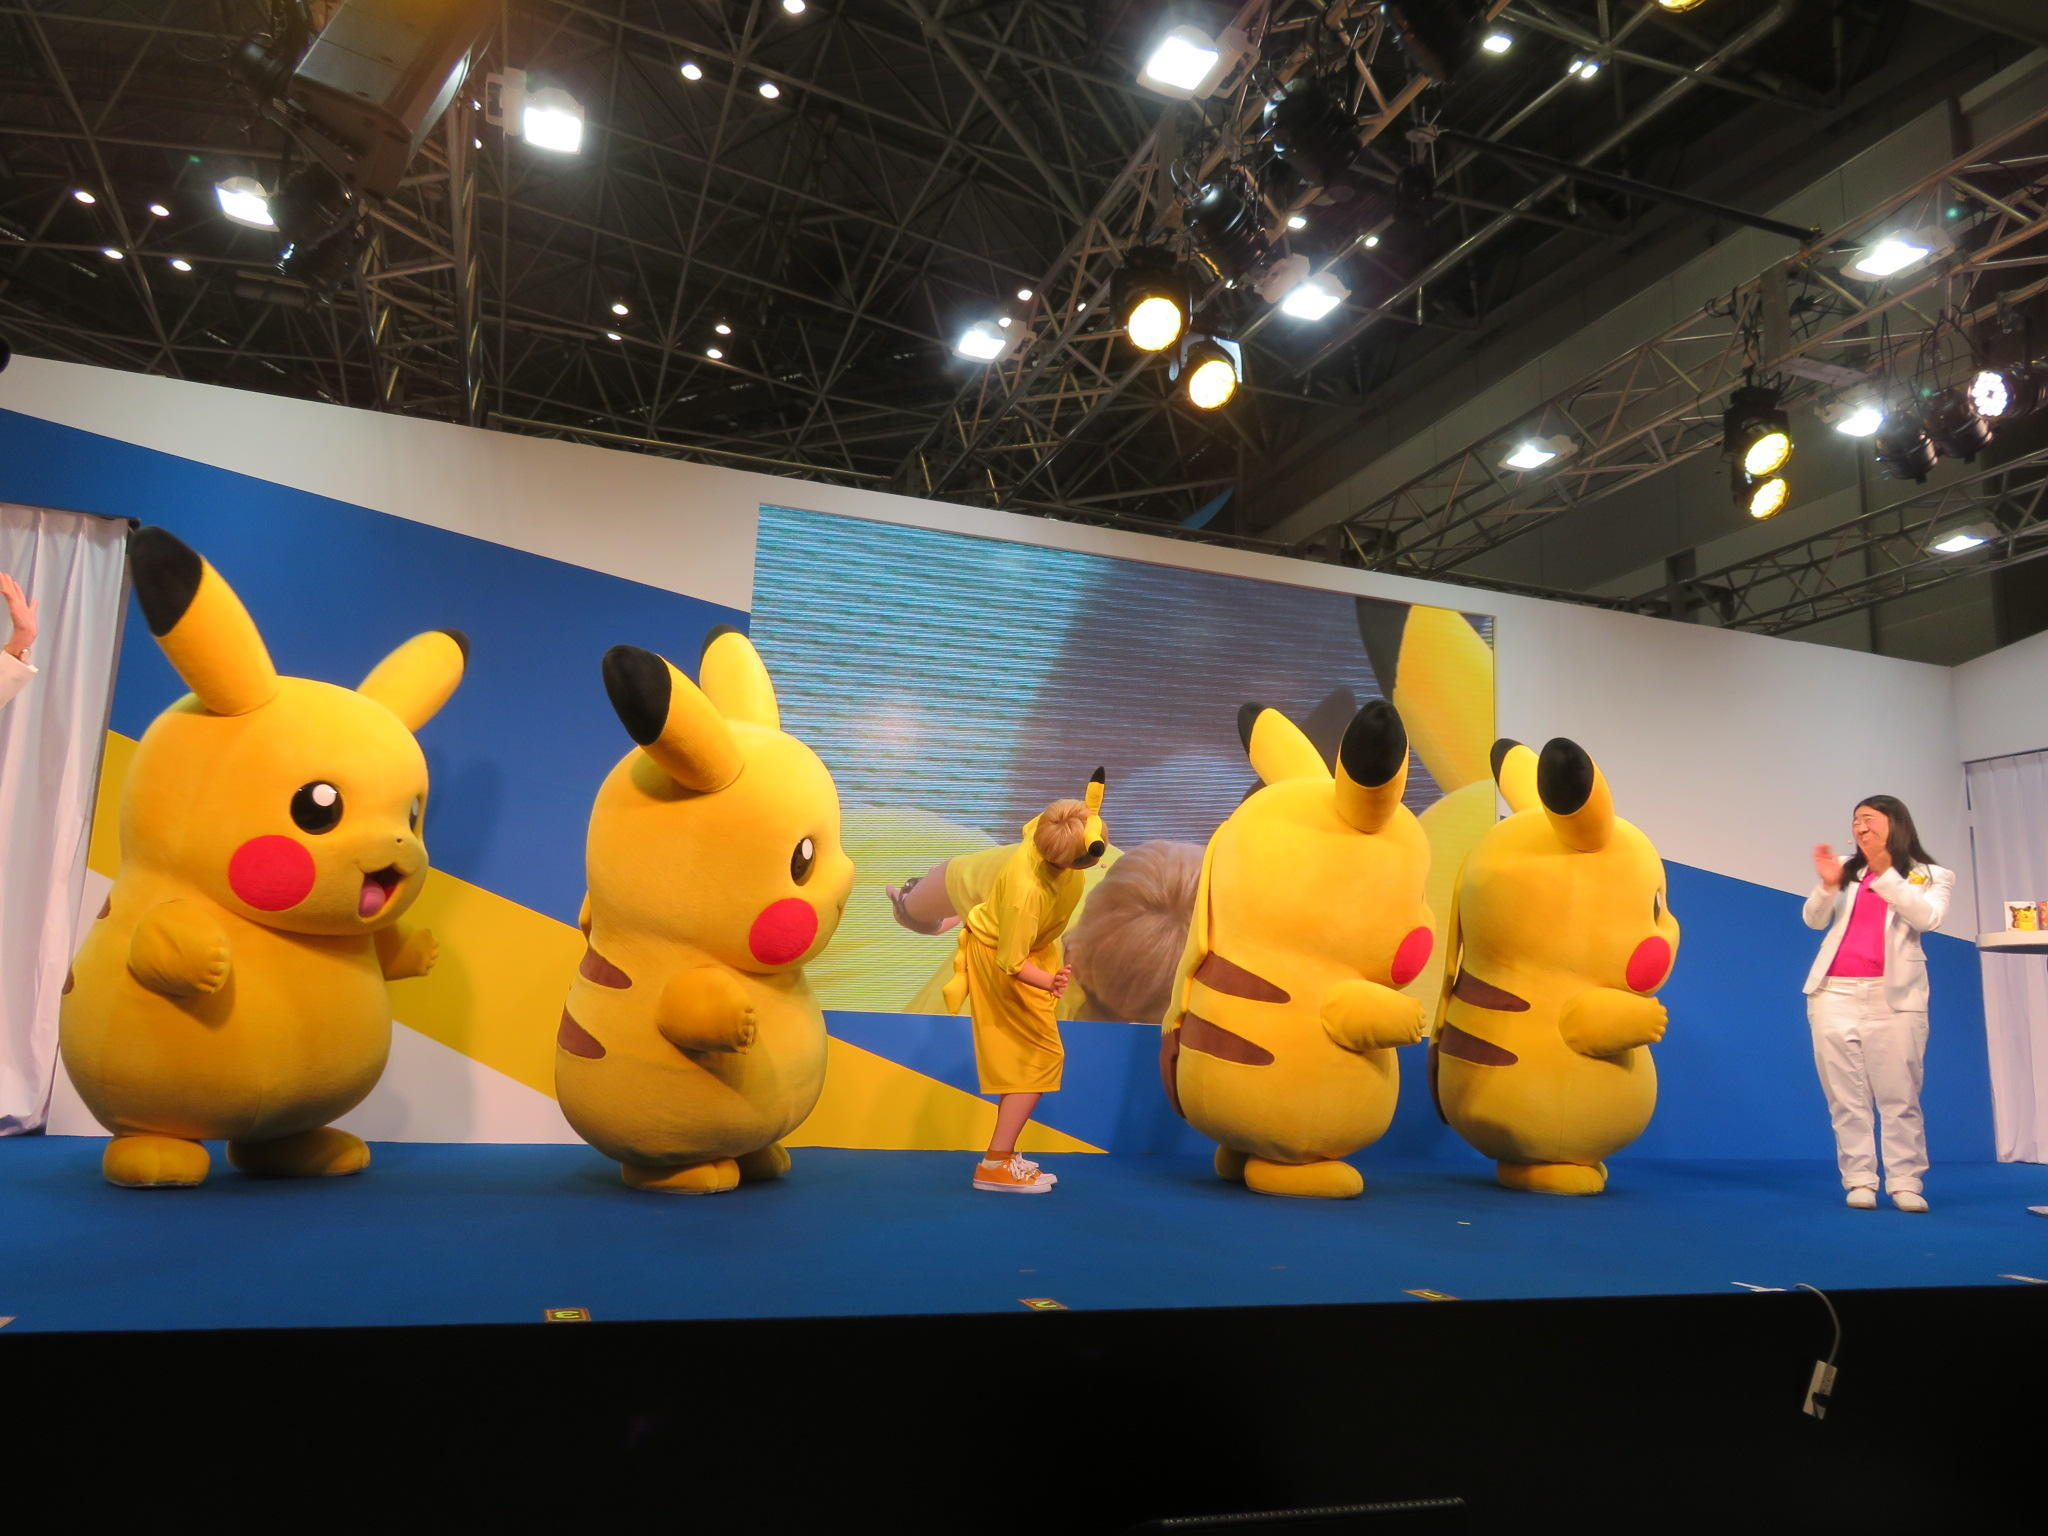 http://news.yoshimoto.co.jp/20180608133953-746a094e70ad885c661bd434a4c21374c738d795.jpg